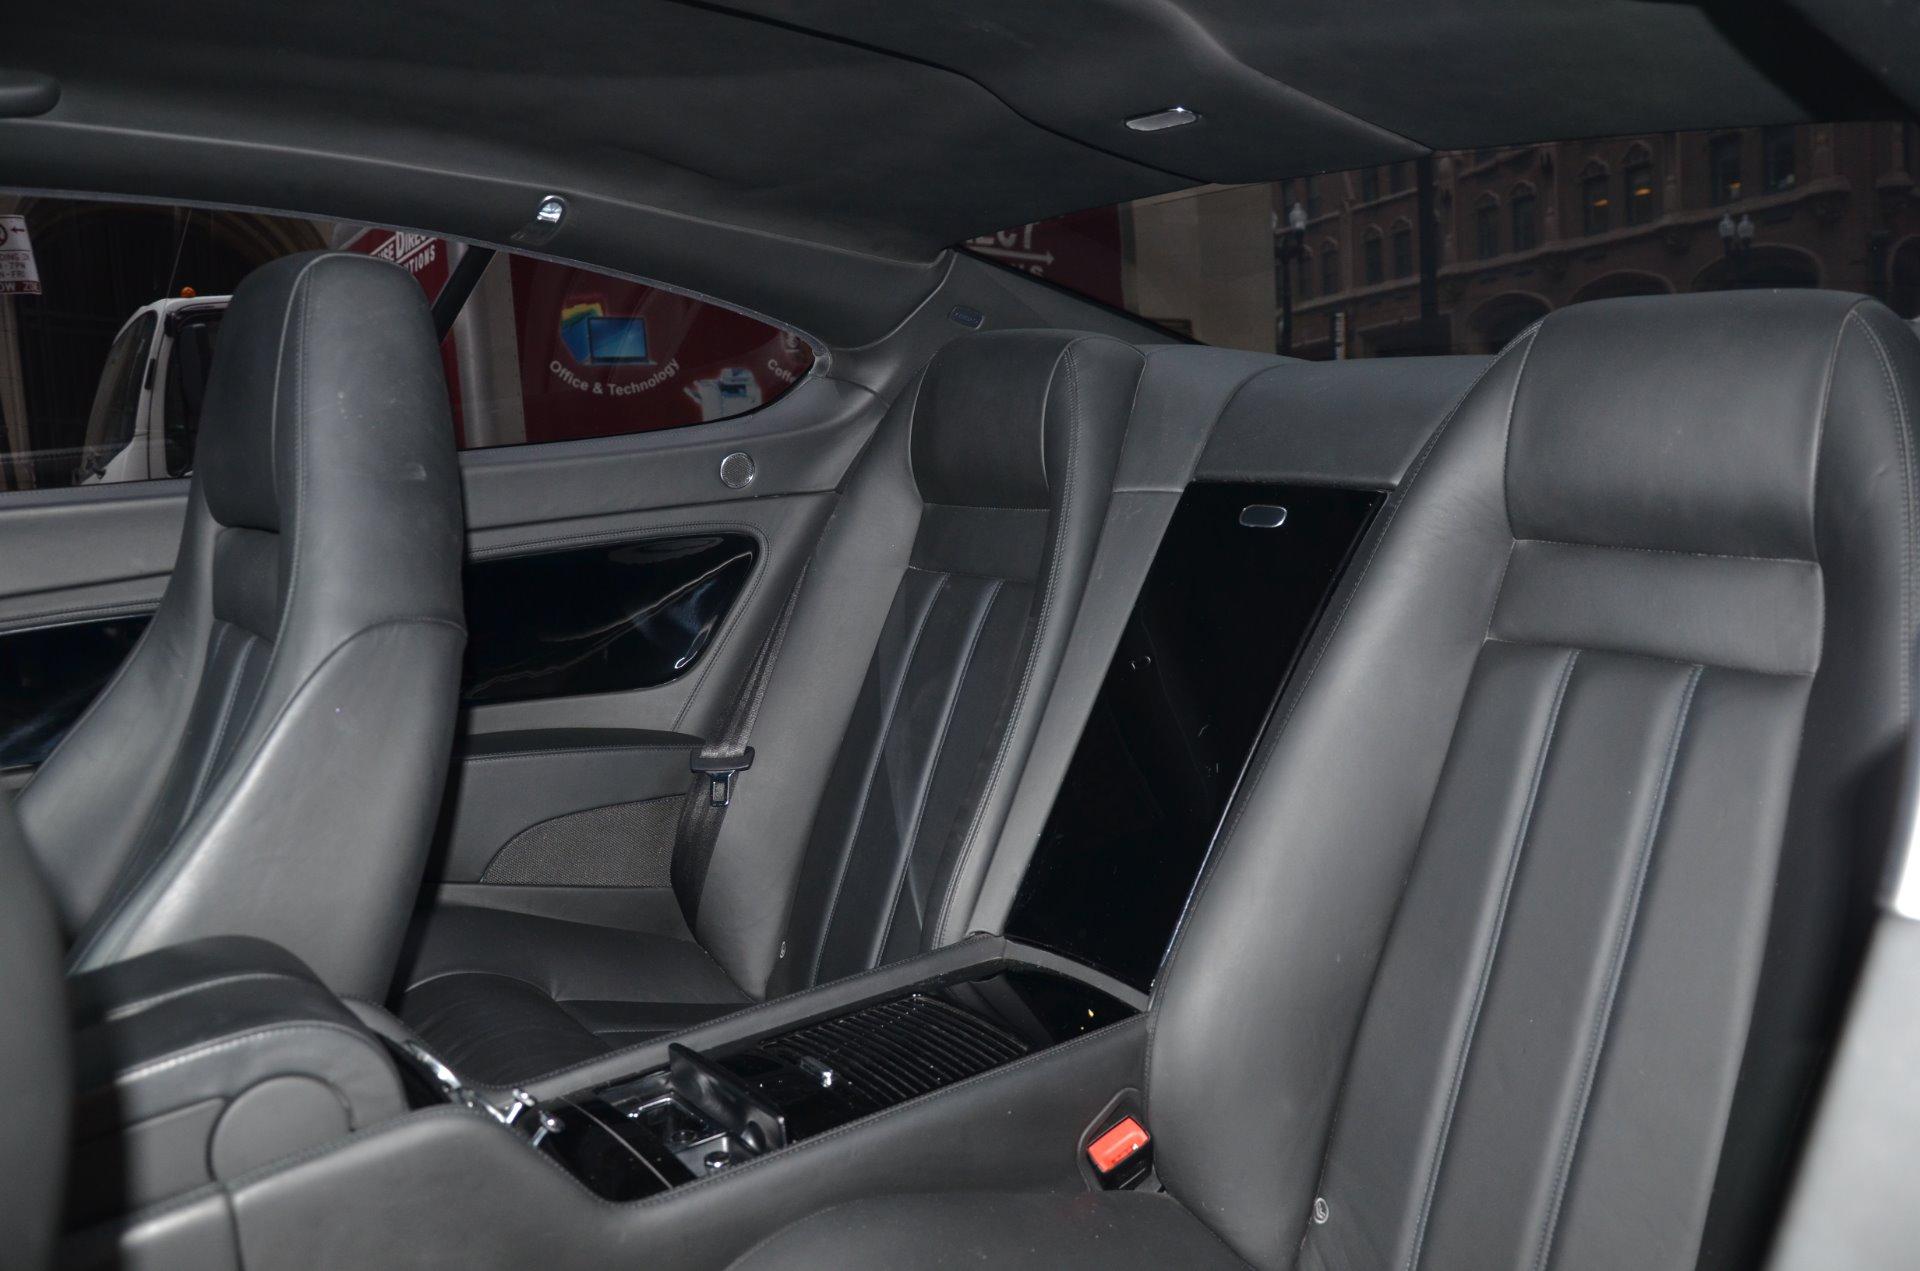 Continental 0300d overhaul manual